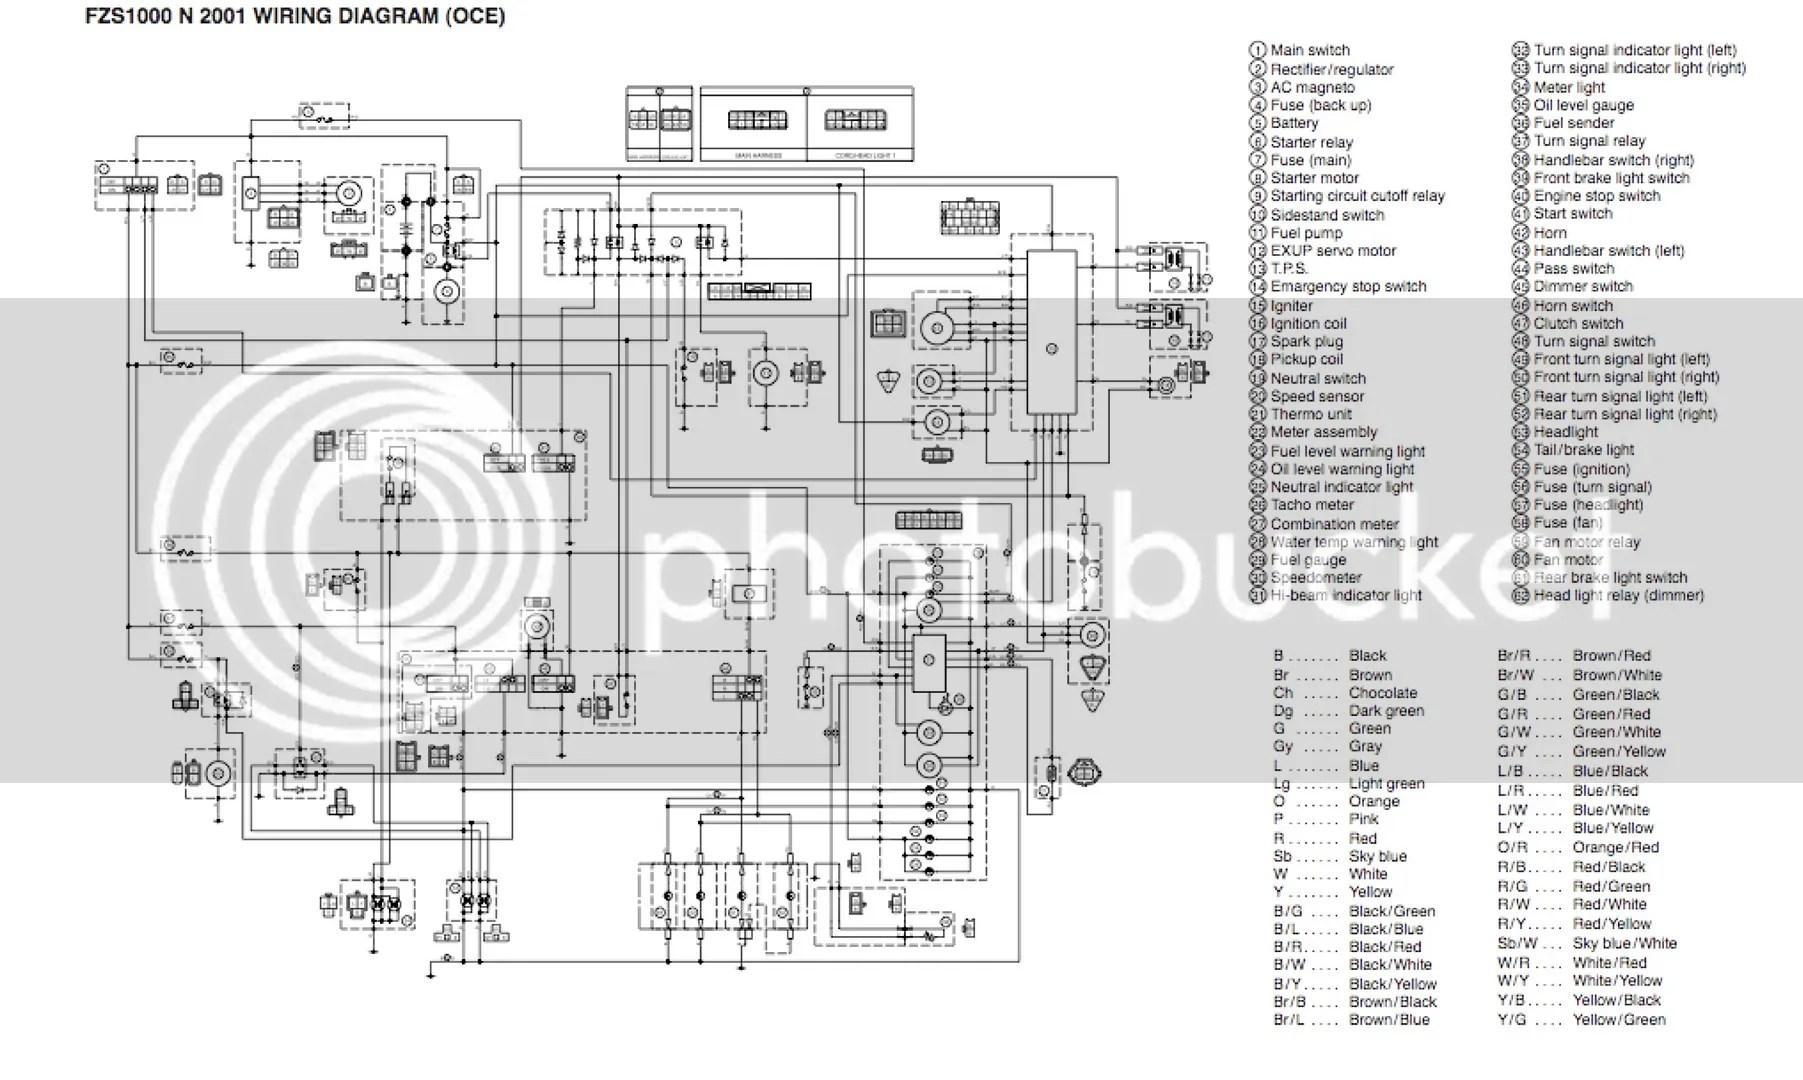 07 R6 Wiring Diagram | Wiring Diagram R Track Bike Wiring Diagram on